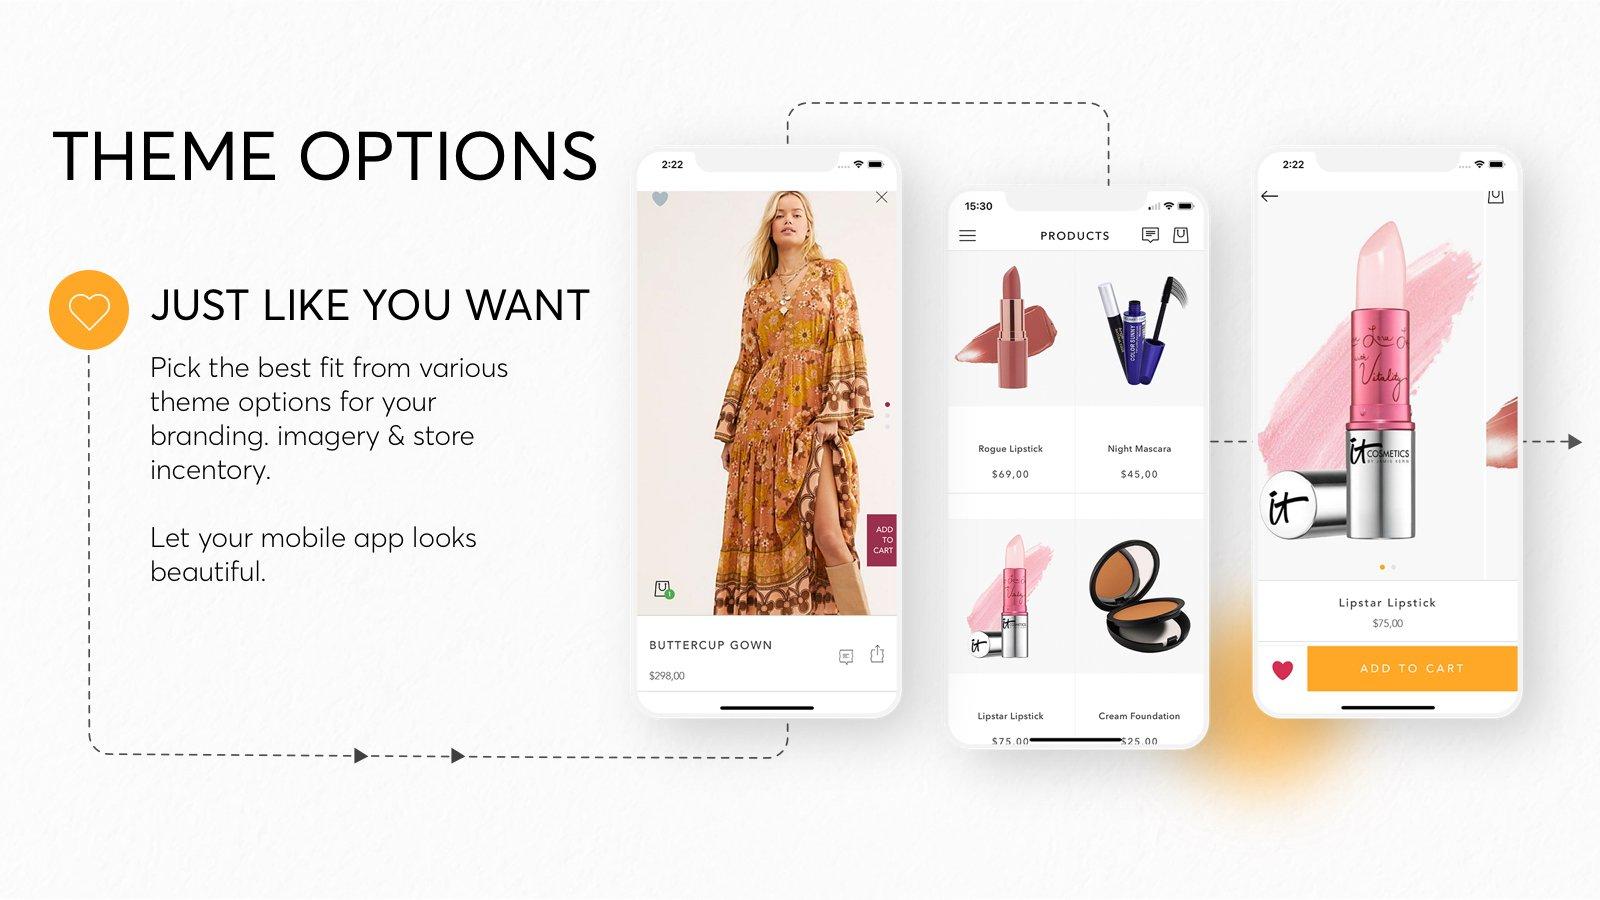 Shopney customizable theme templates